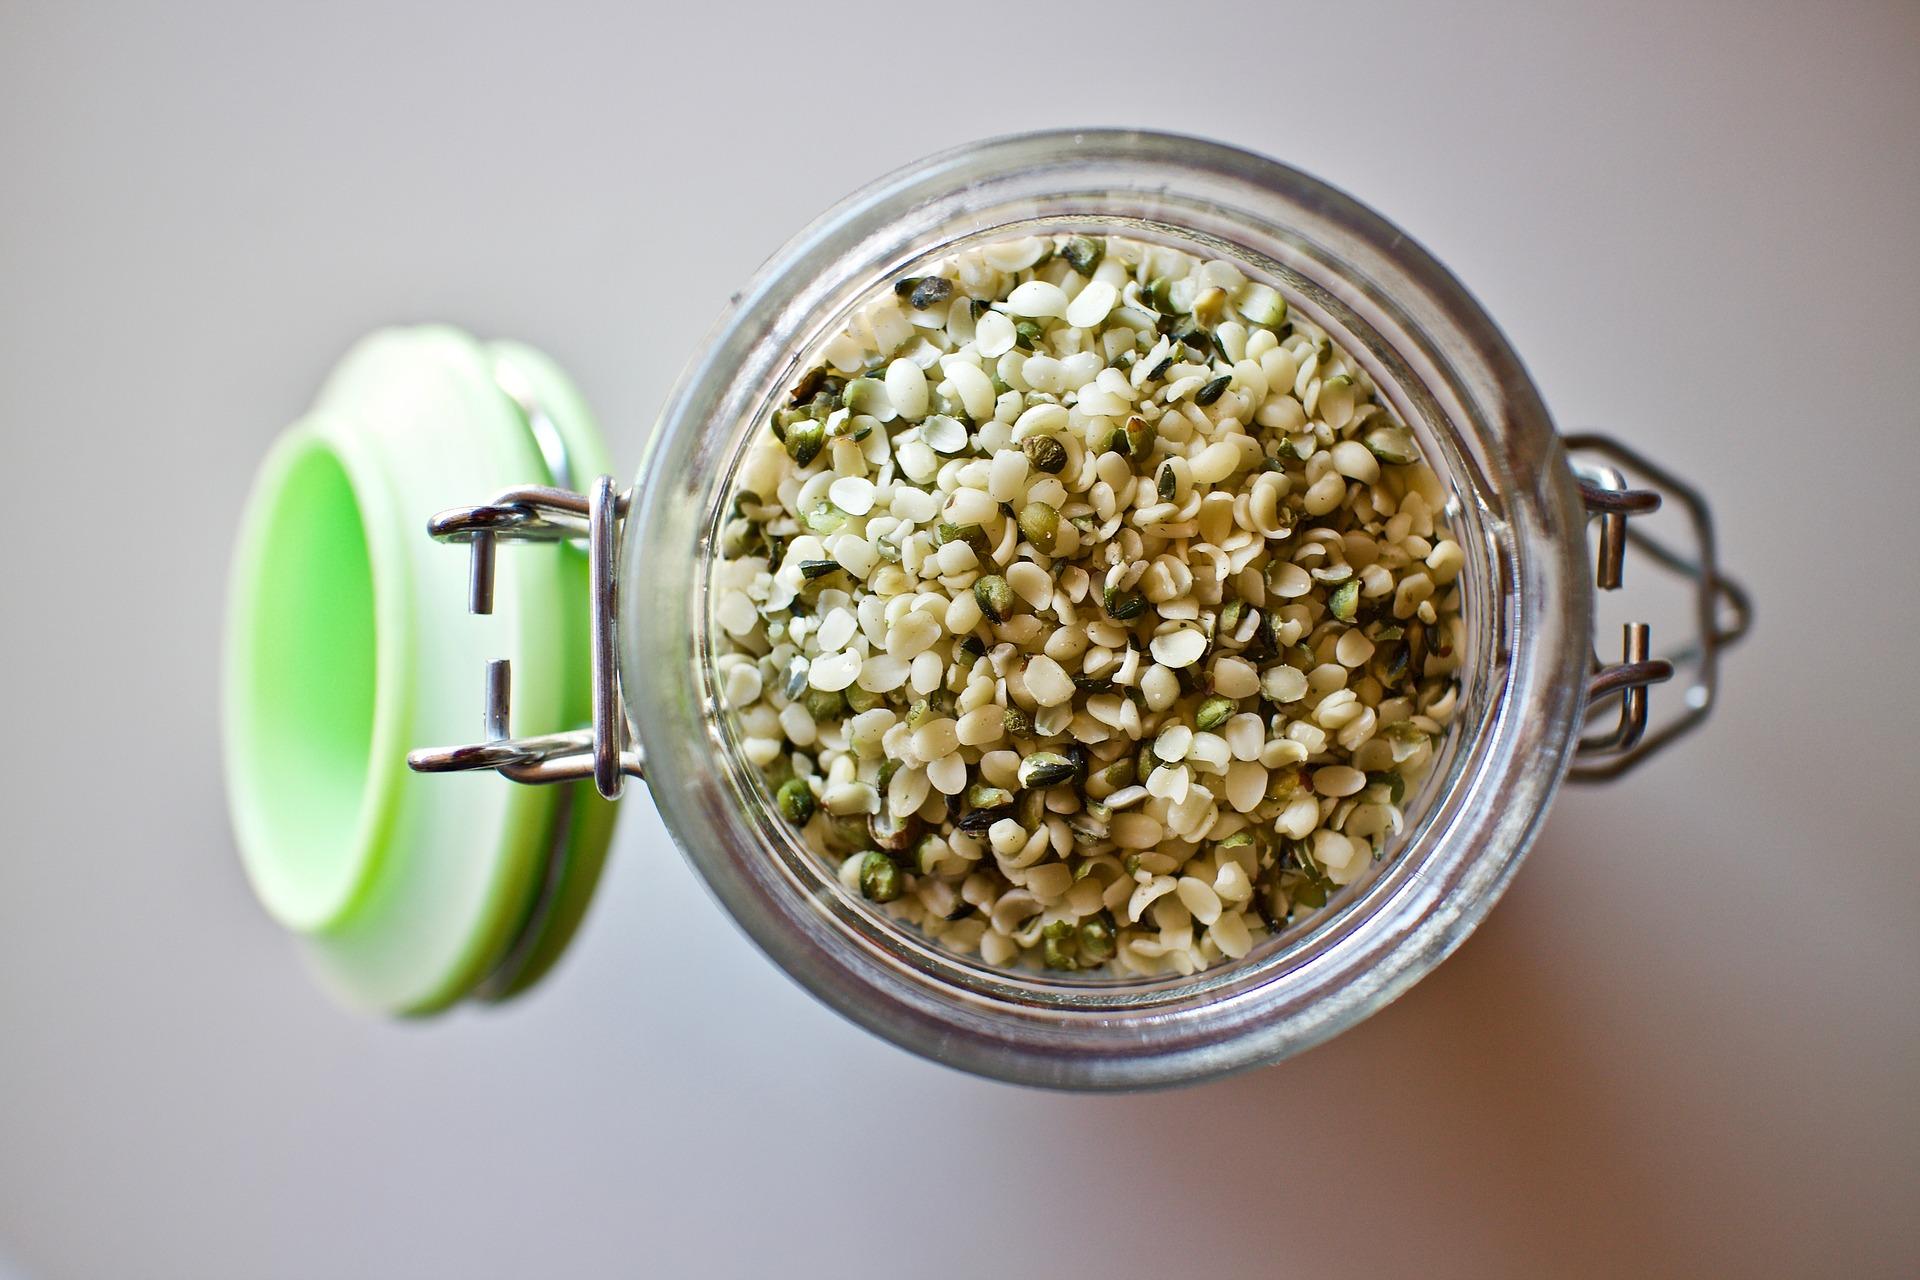 Super Seeds: Hemp, Flax, Chia - State of Fitness